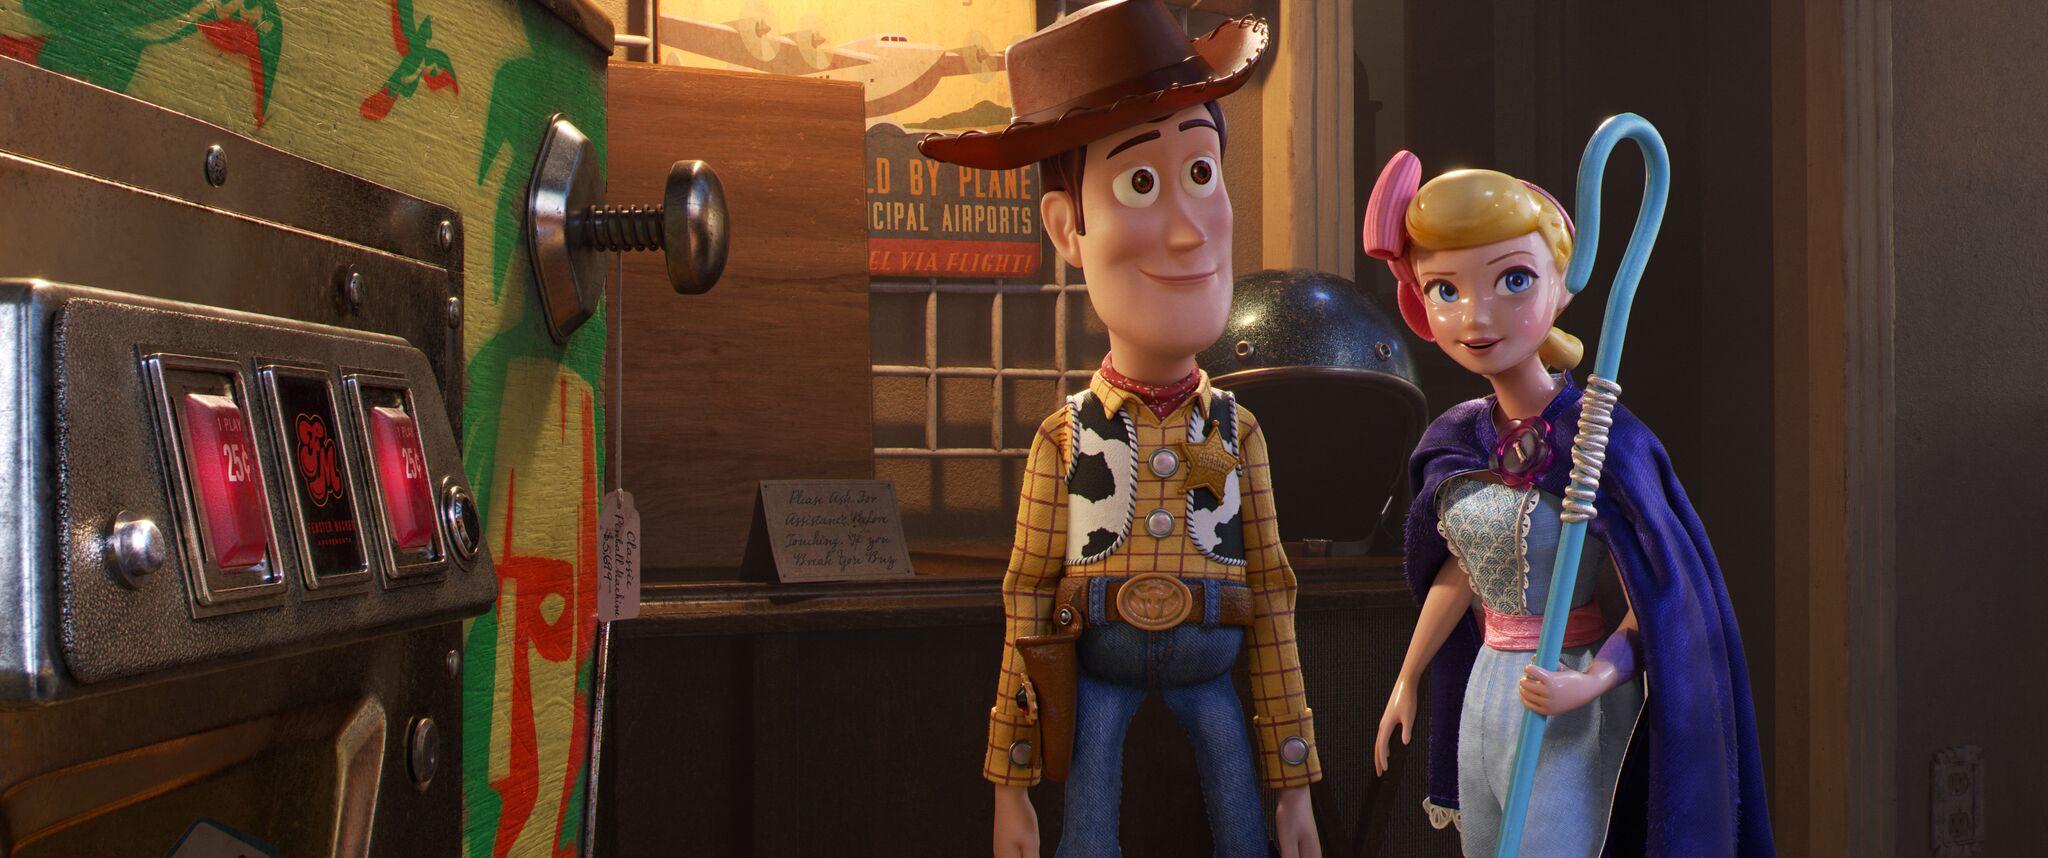 toy story 4 woody forky pixar cinema film recensione